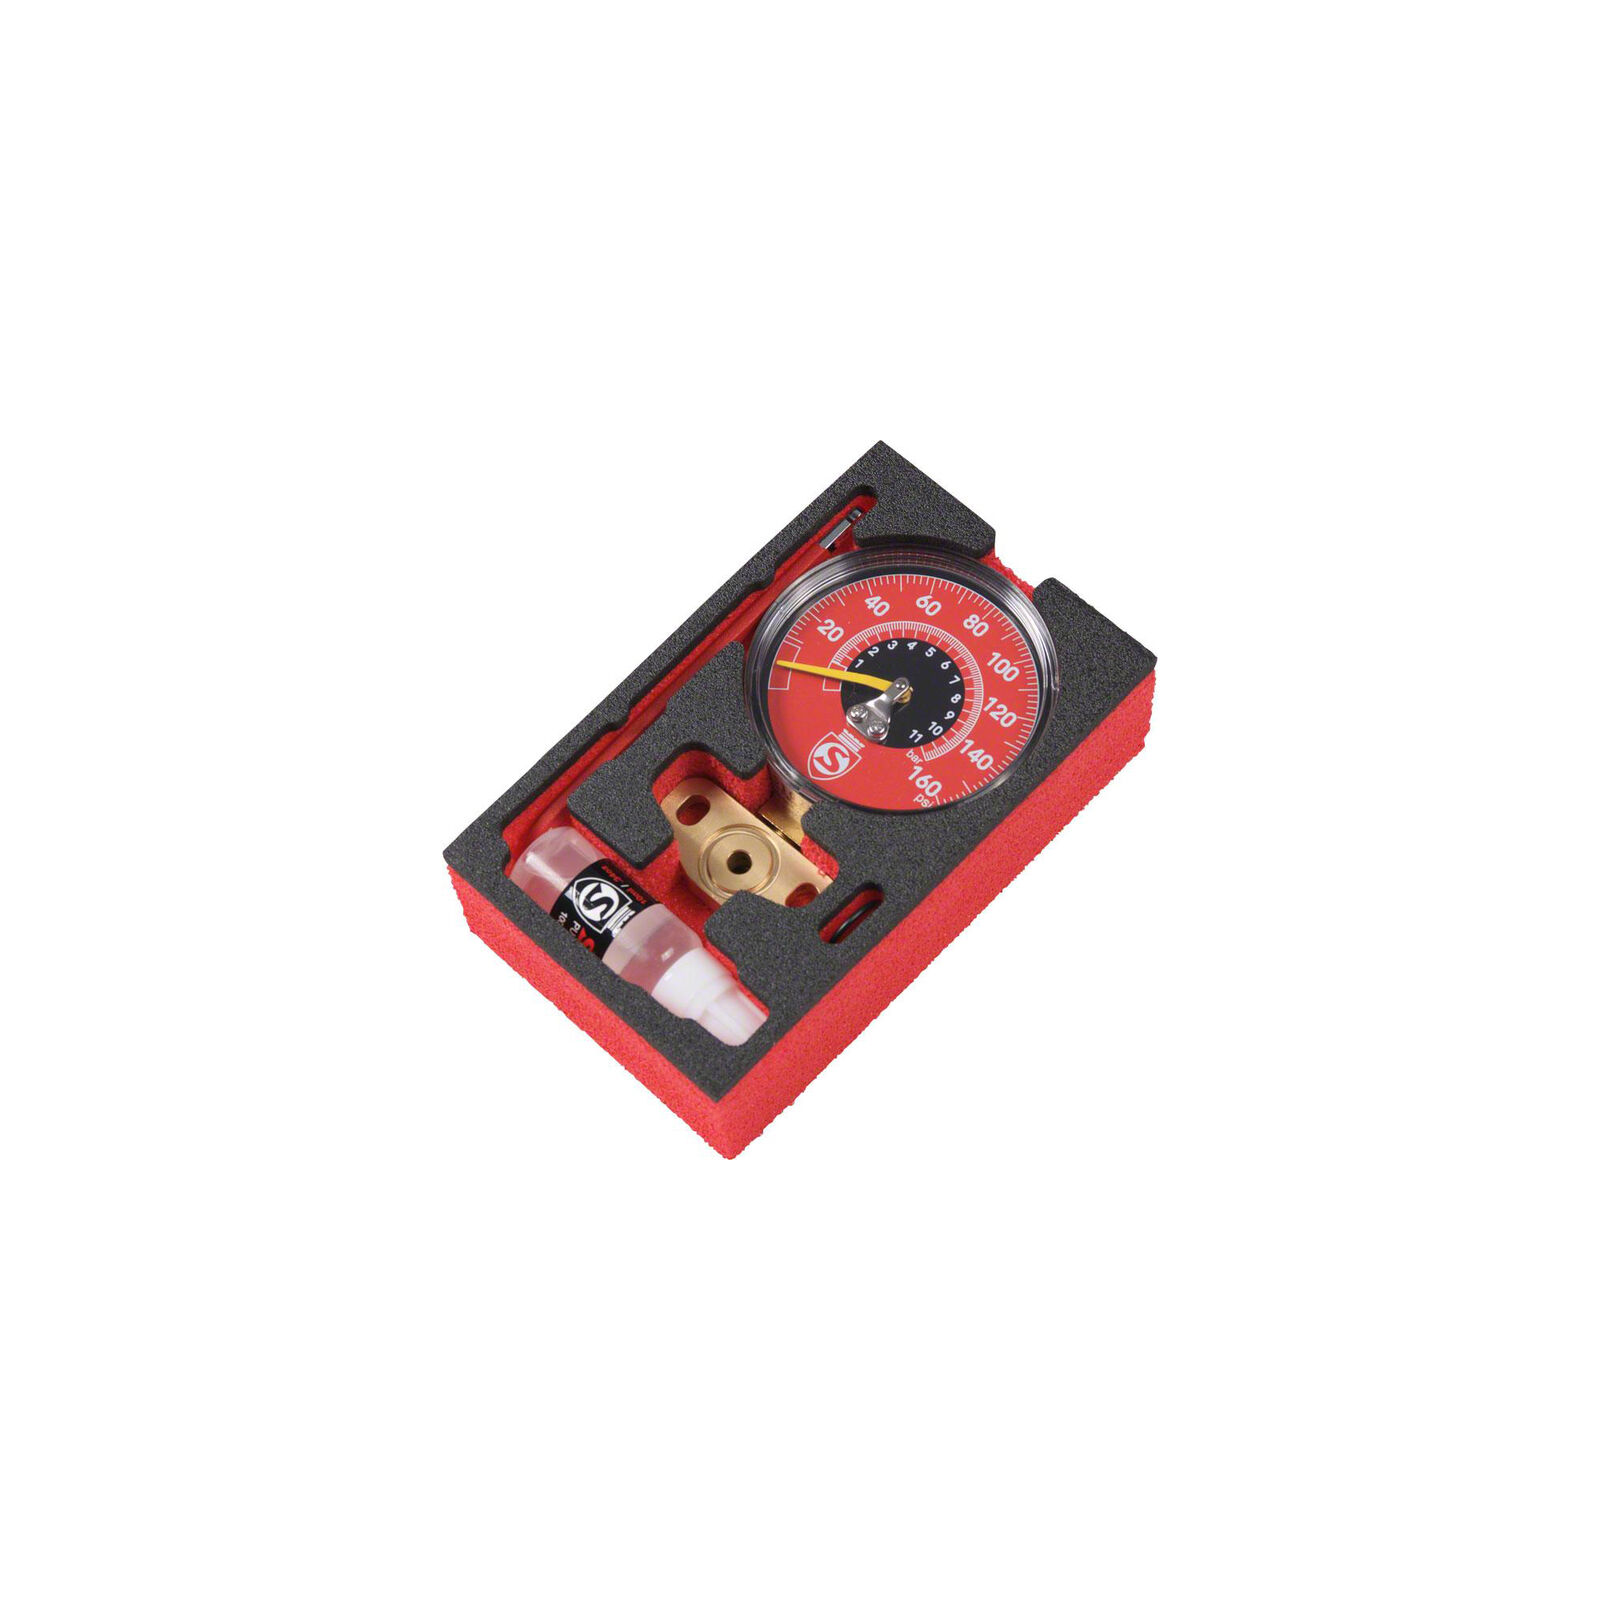 Silca Super Pista Ultimate 160psi High Pressure Gauge, rosso